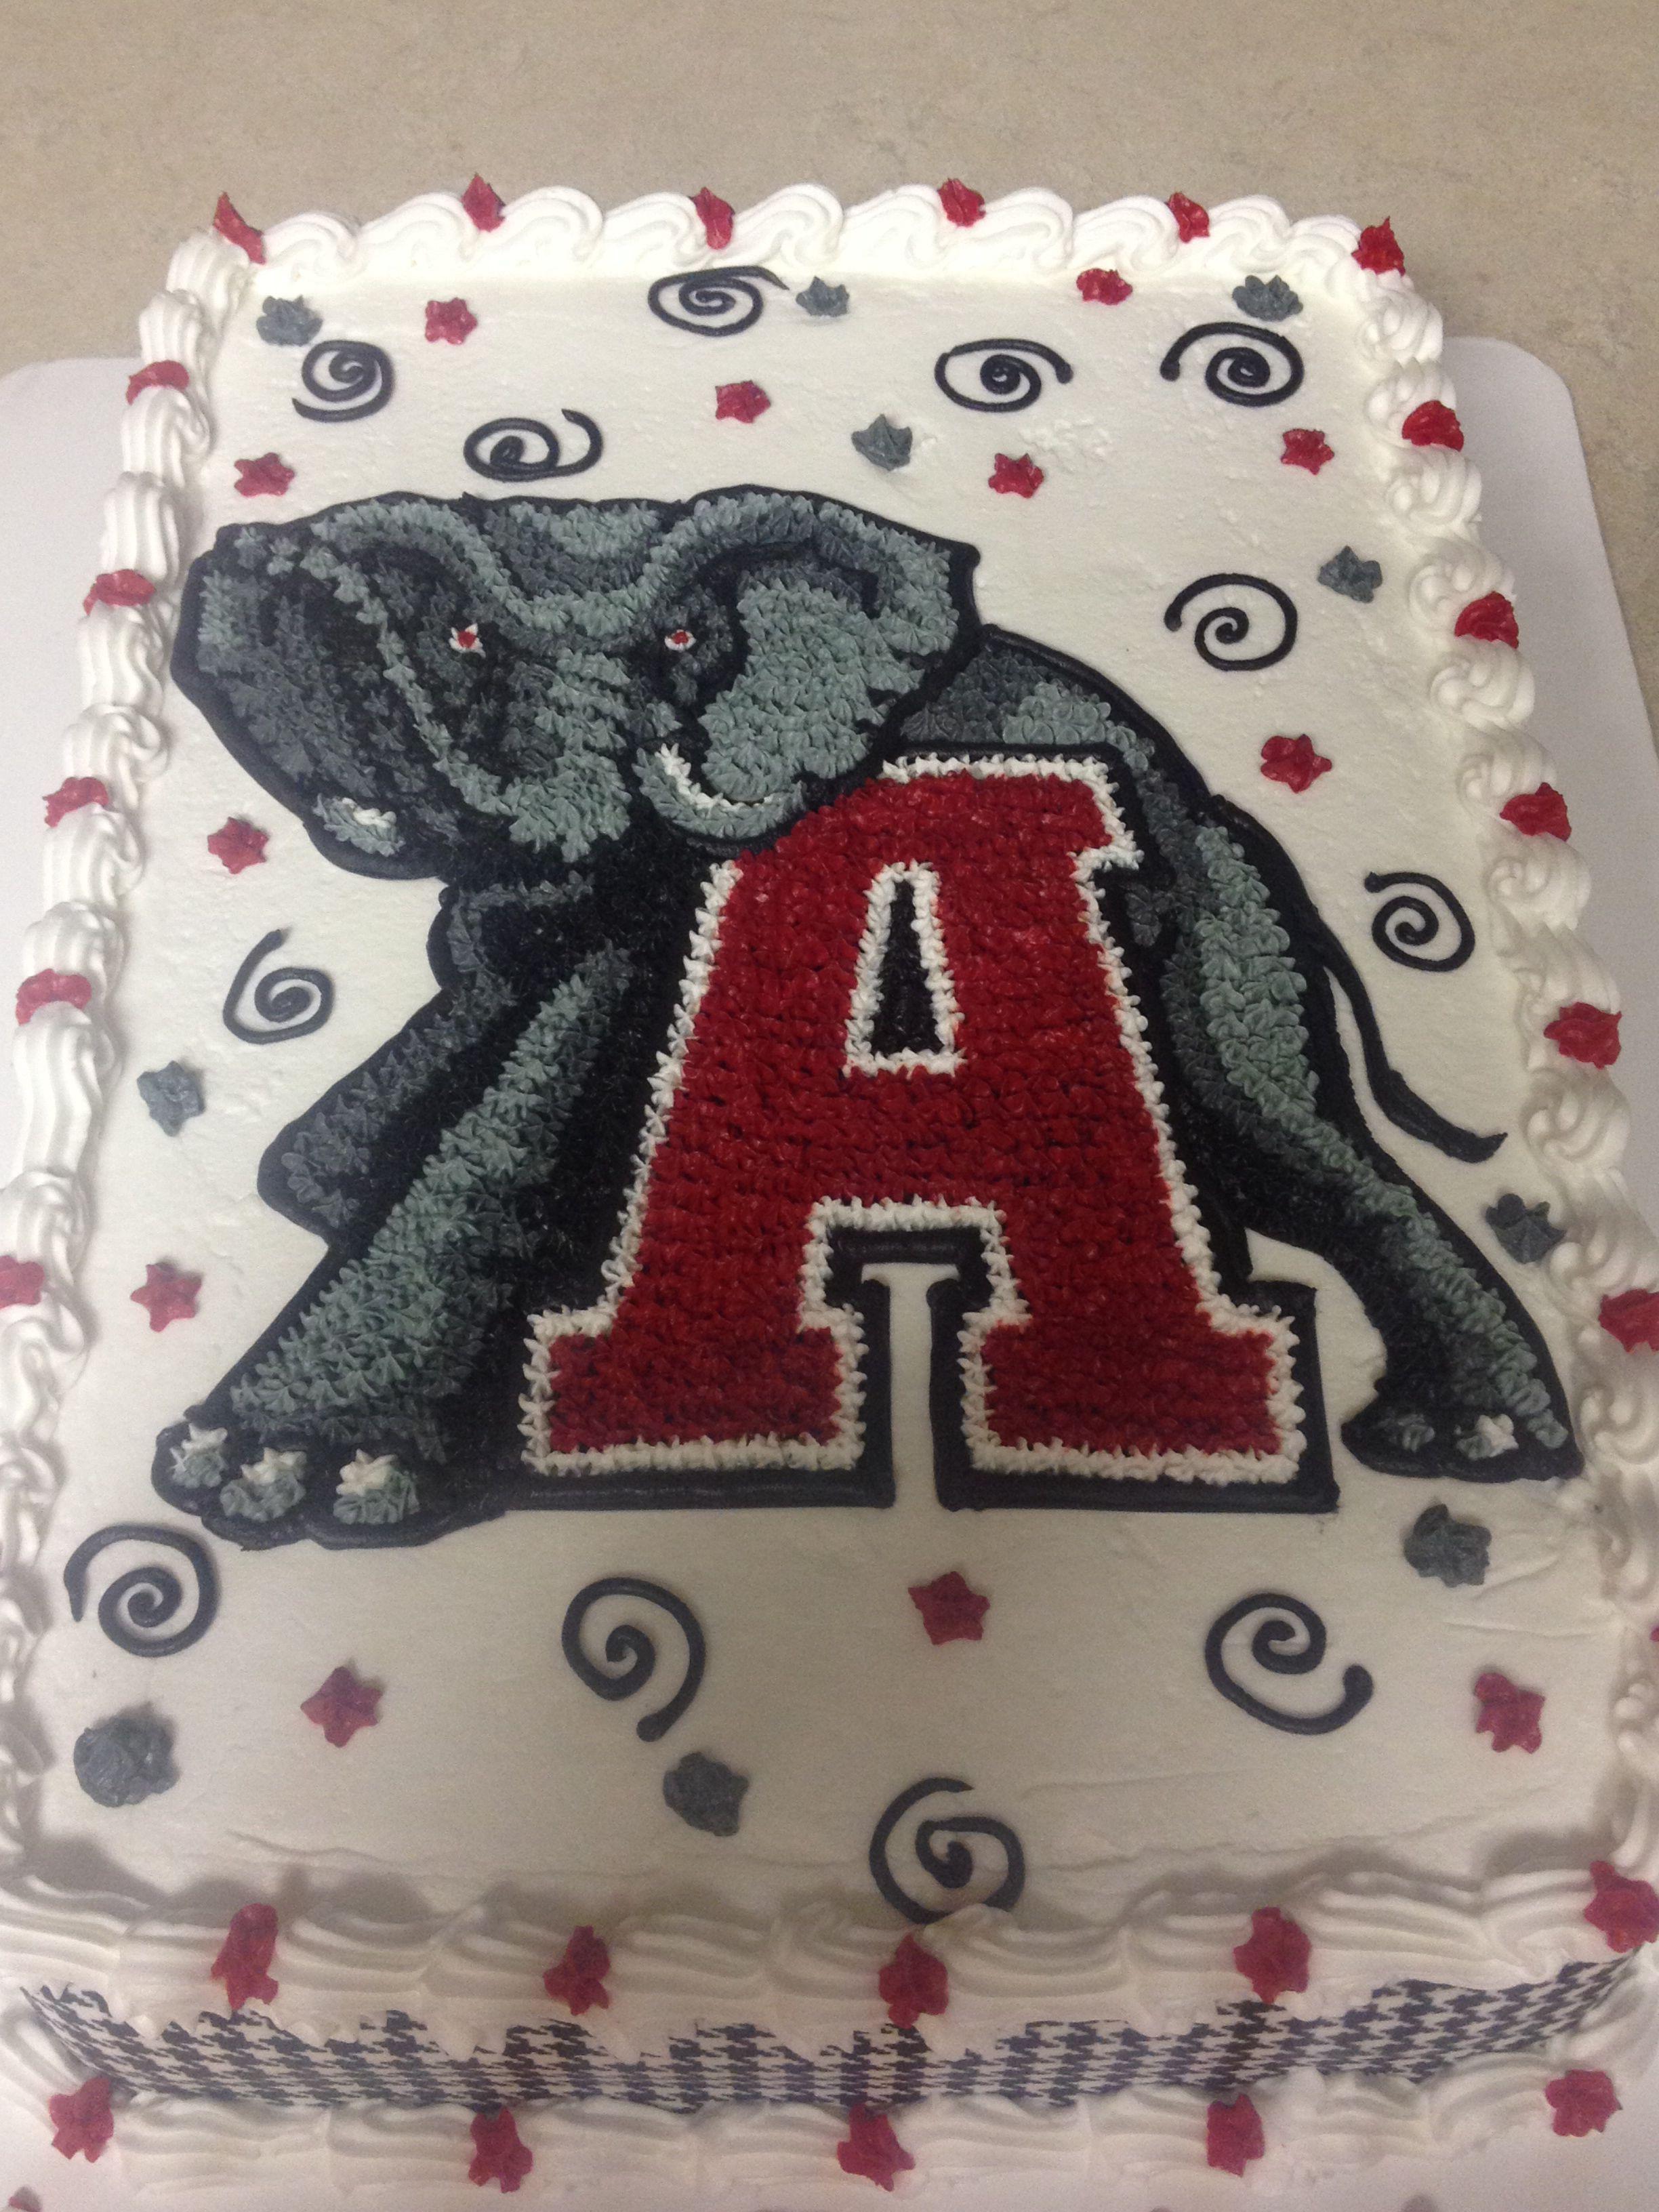 Tremendous Alabama Birthday Cake For Jason Alabama Birthday Cakes Alabama Personalised Birthday Cards Veneteletsinfo